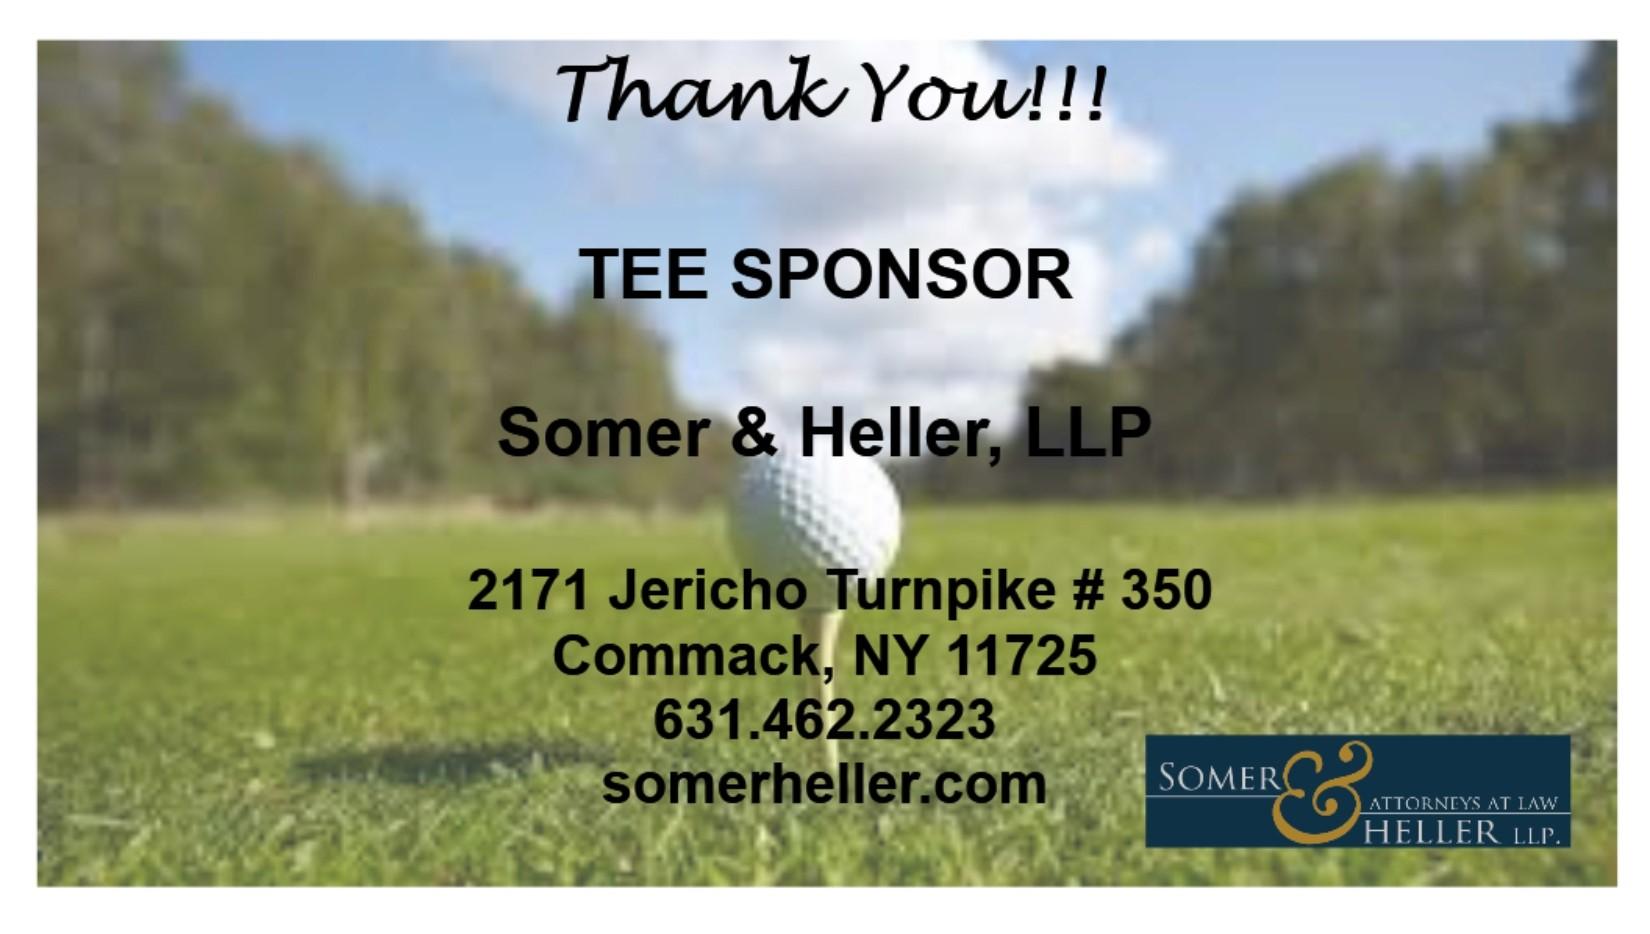 Somer & Heller, LLP